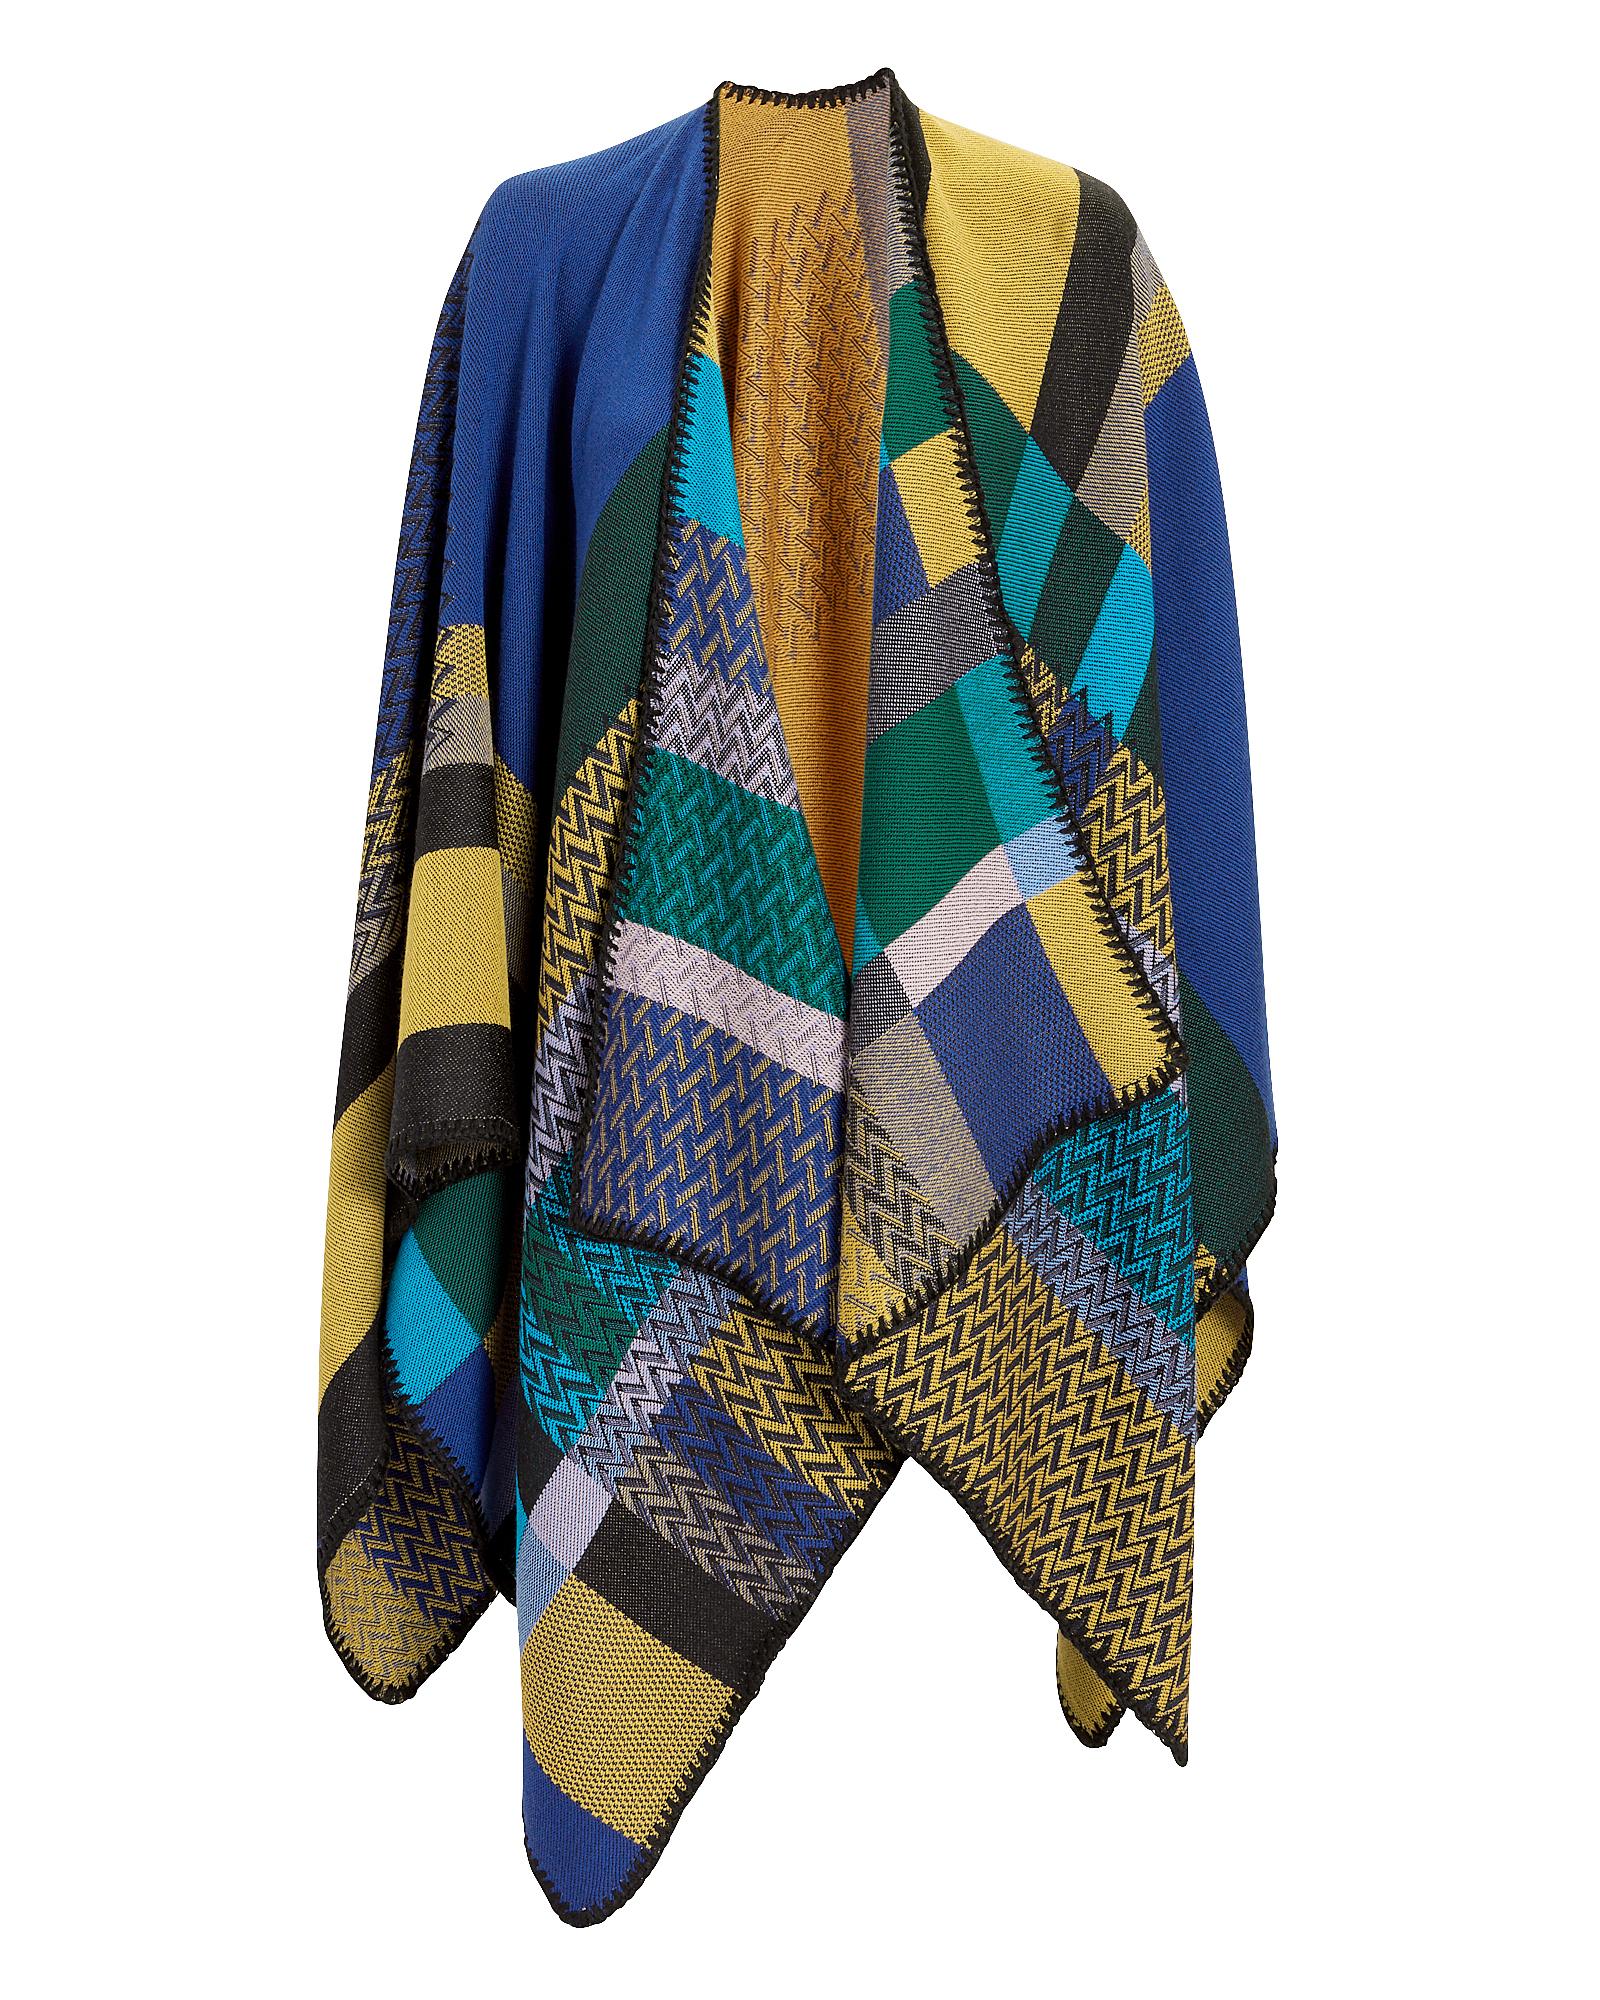 Mixed Knit Print Cape